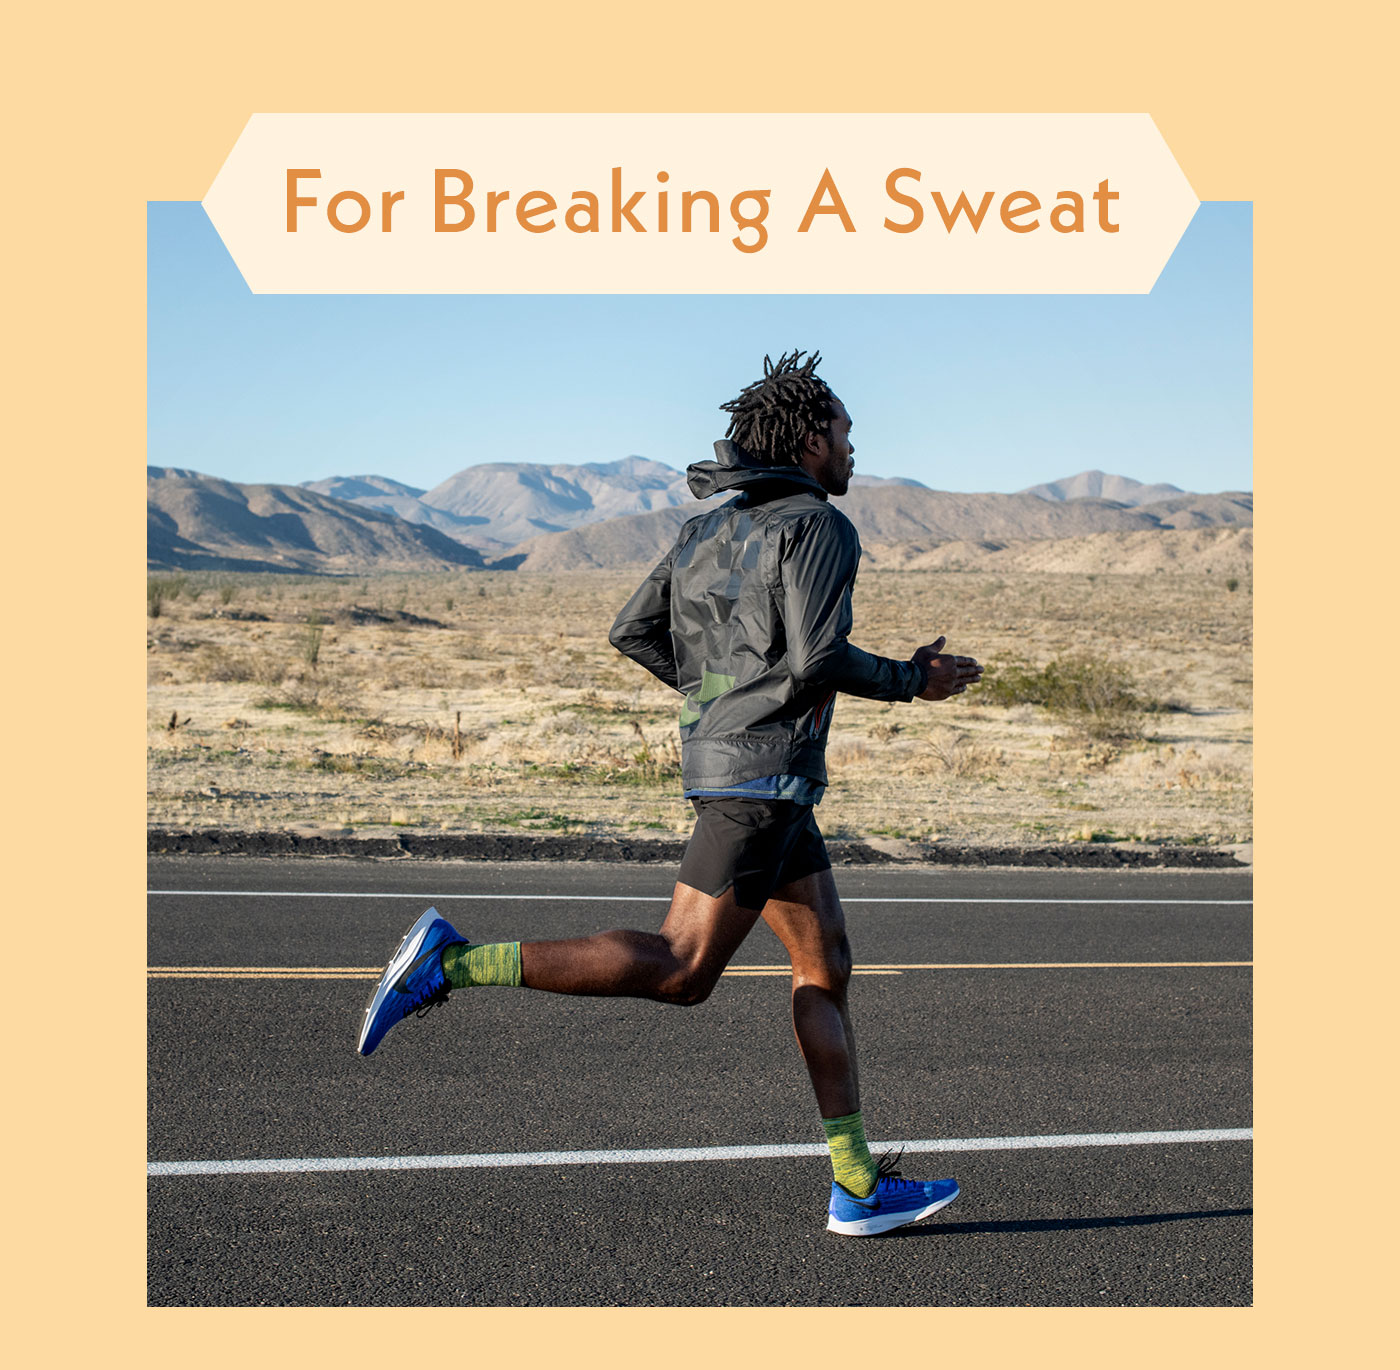 For Breaking A Sweat